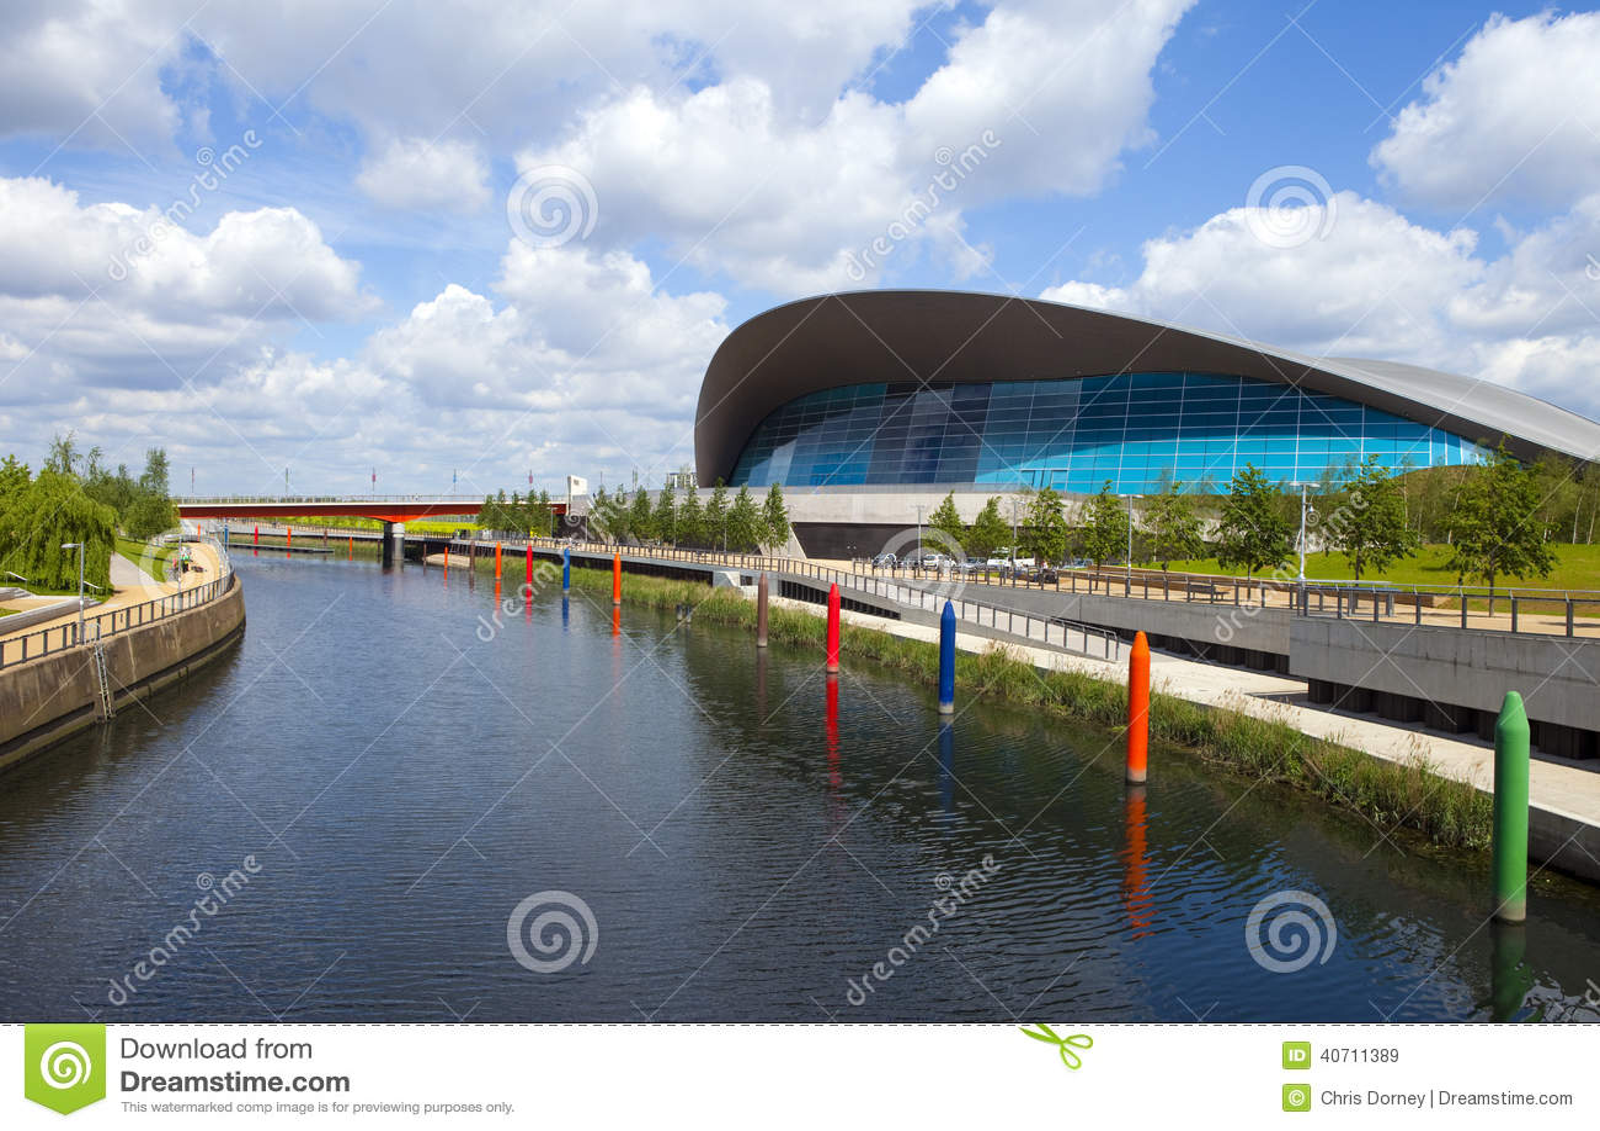 The Aquatics Centre In The Queen Elizabeth Olympic Park In Londo Editorial Stock Image Image